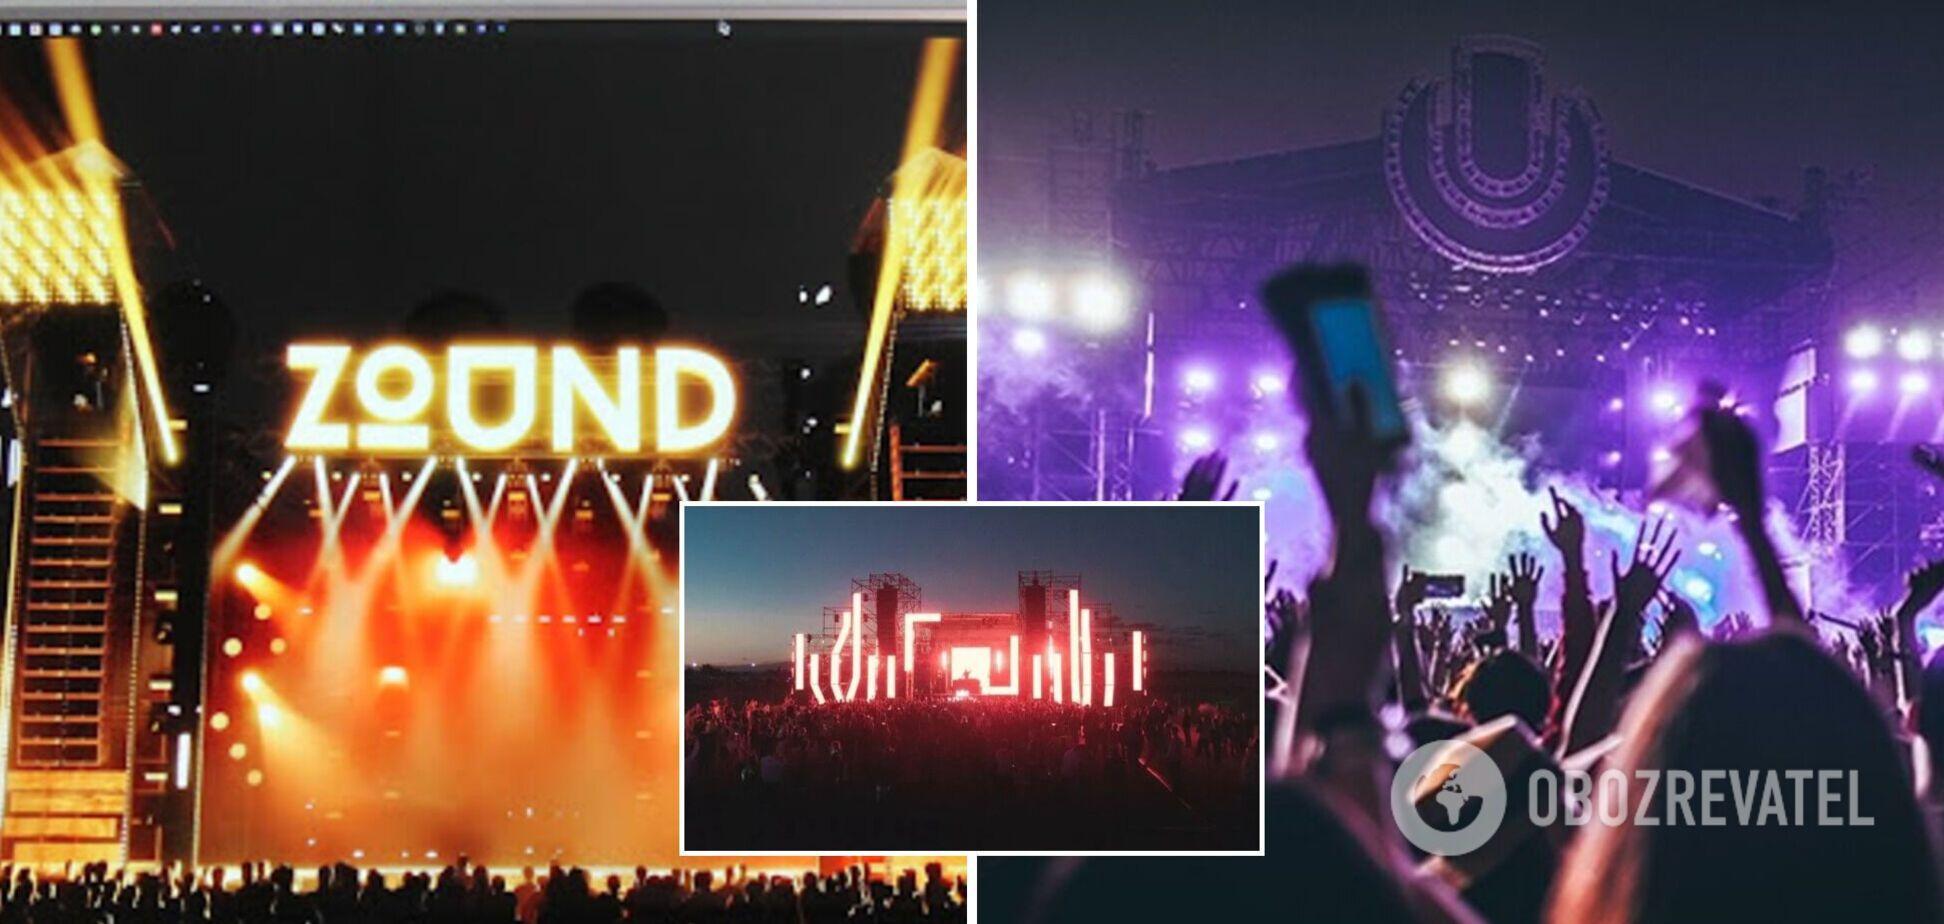 42 години музики: що готує фестиваль ZOUND-2021